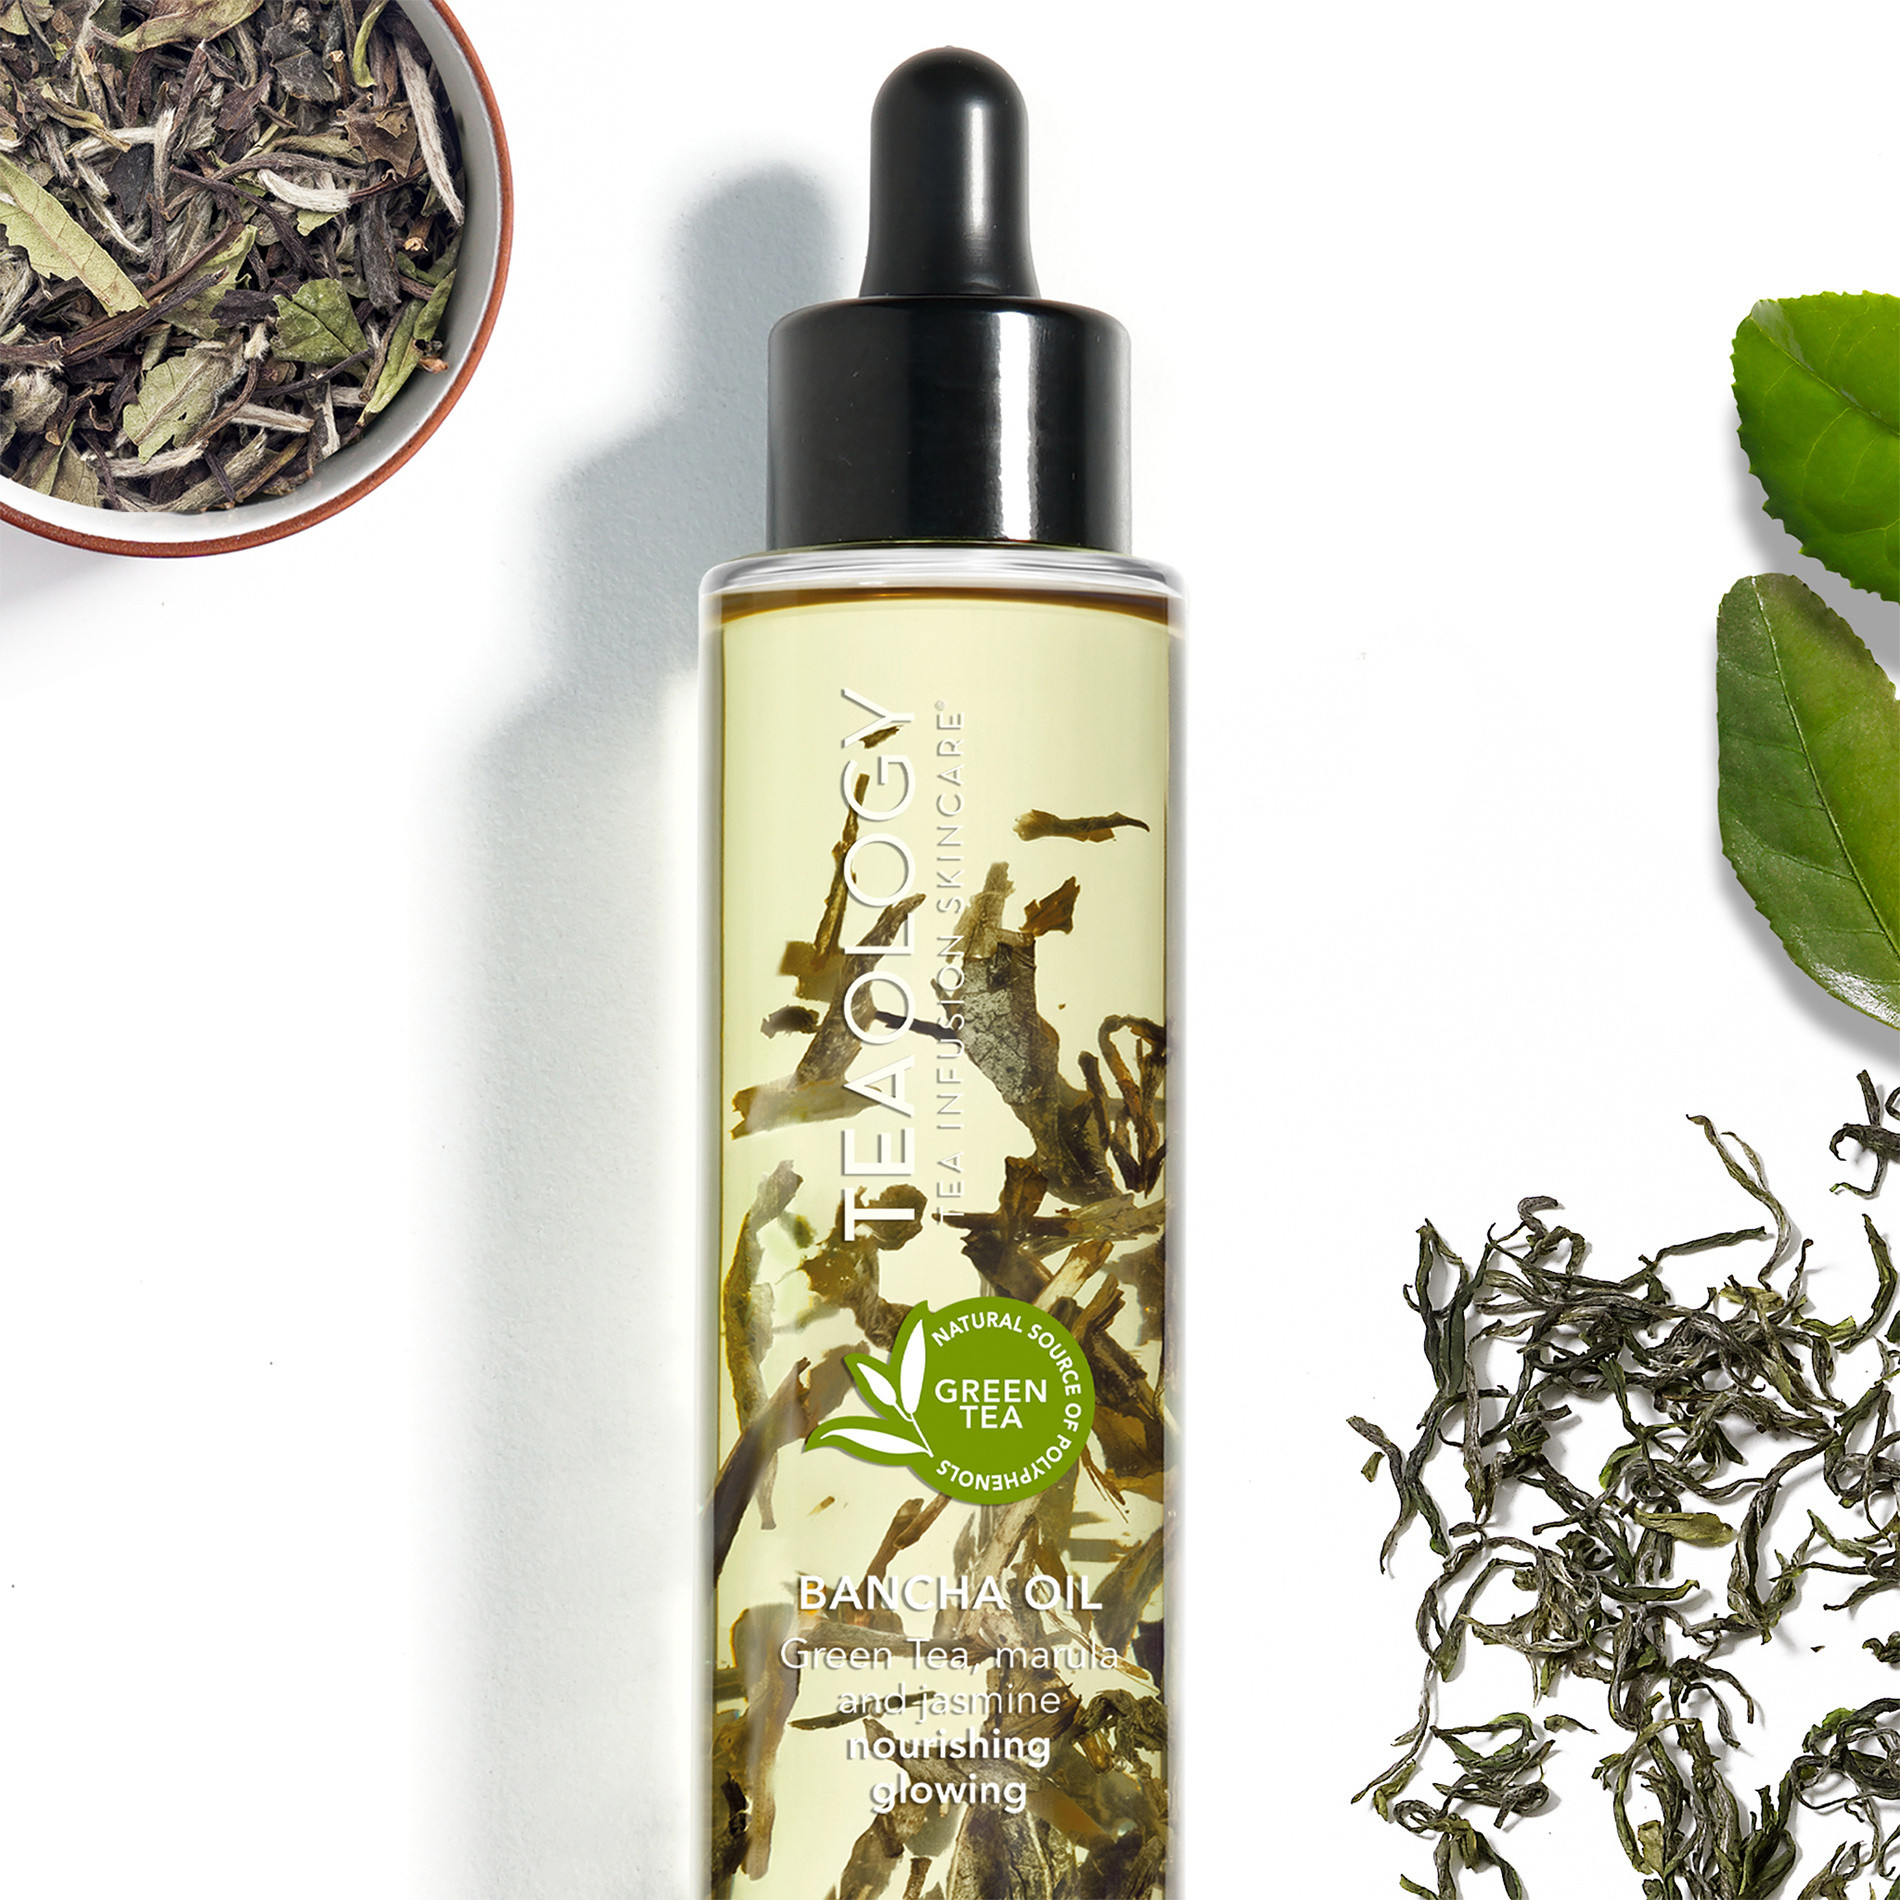 Teaology Bancha Oil 100 ml, Bianco, large image number 2